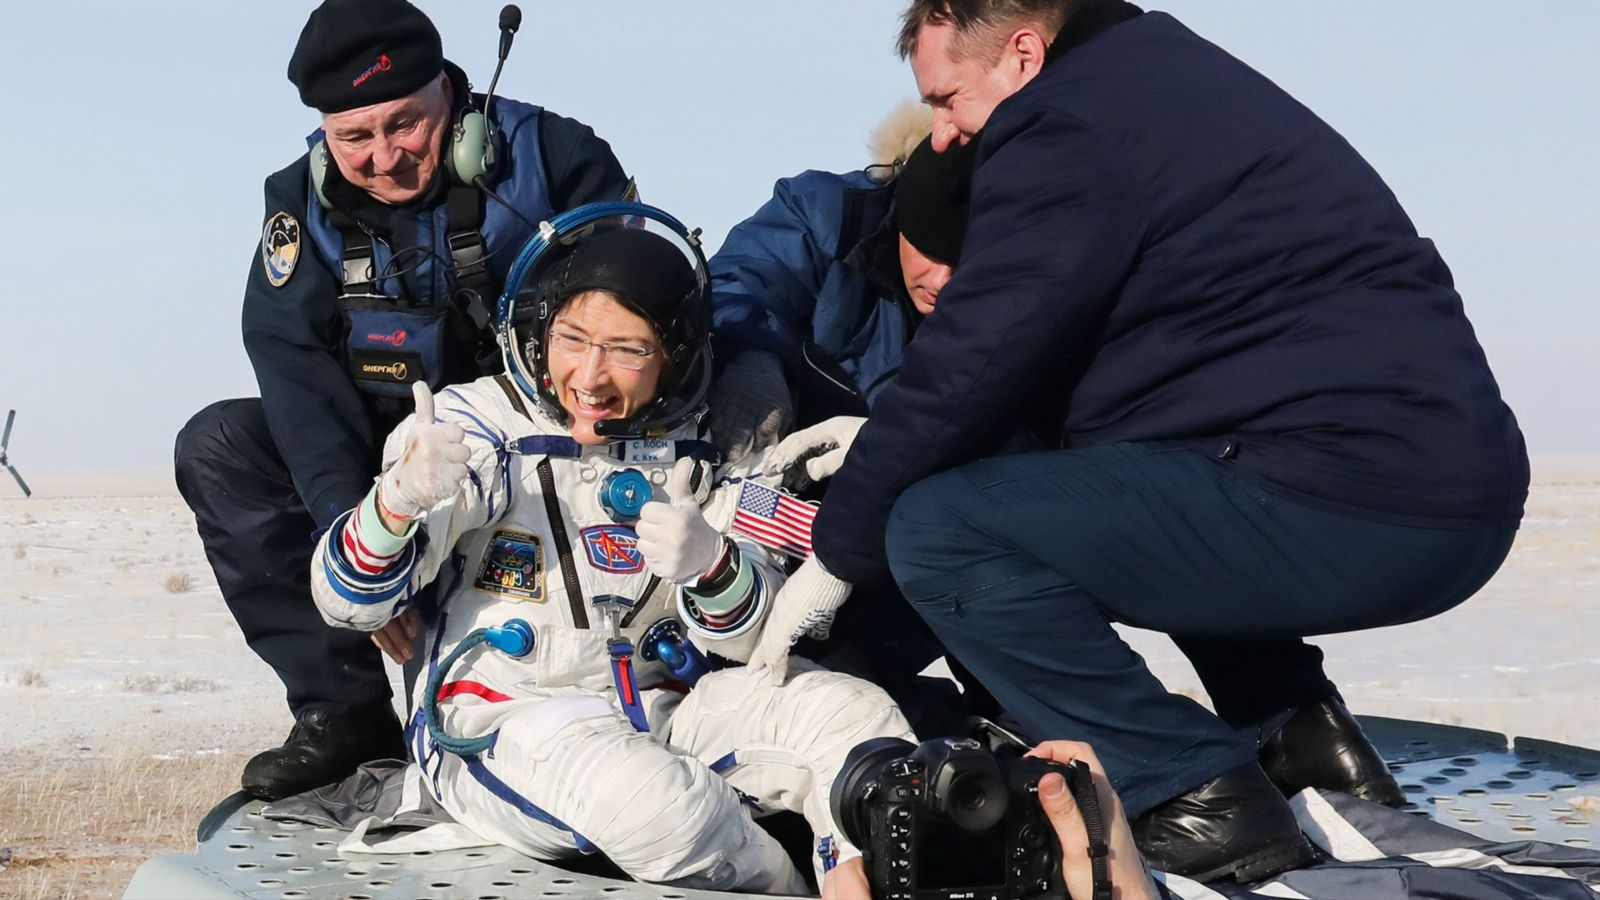 Rekord-Astronautin: Christina Koch, wie fühlt sich das Leben im Weltraum an?